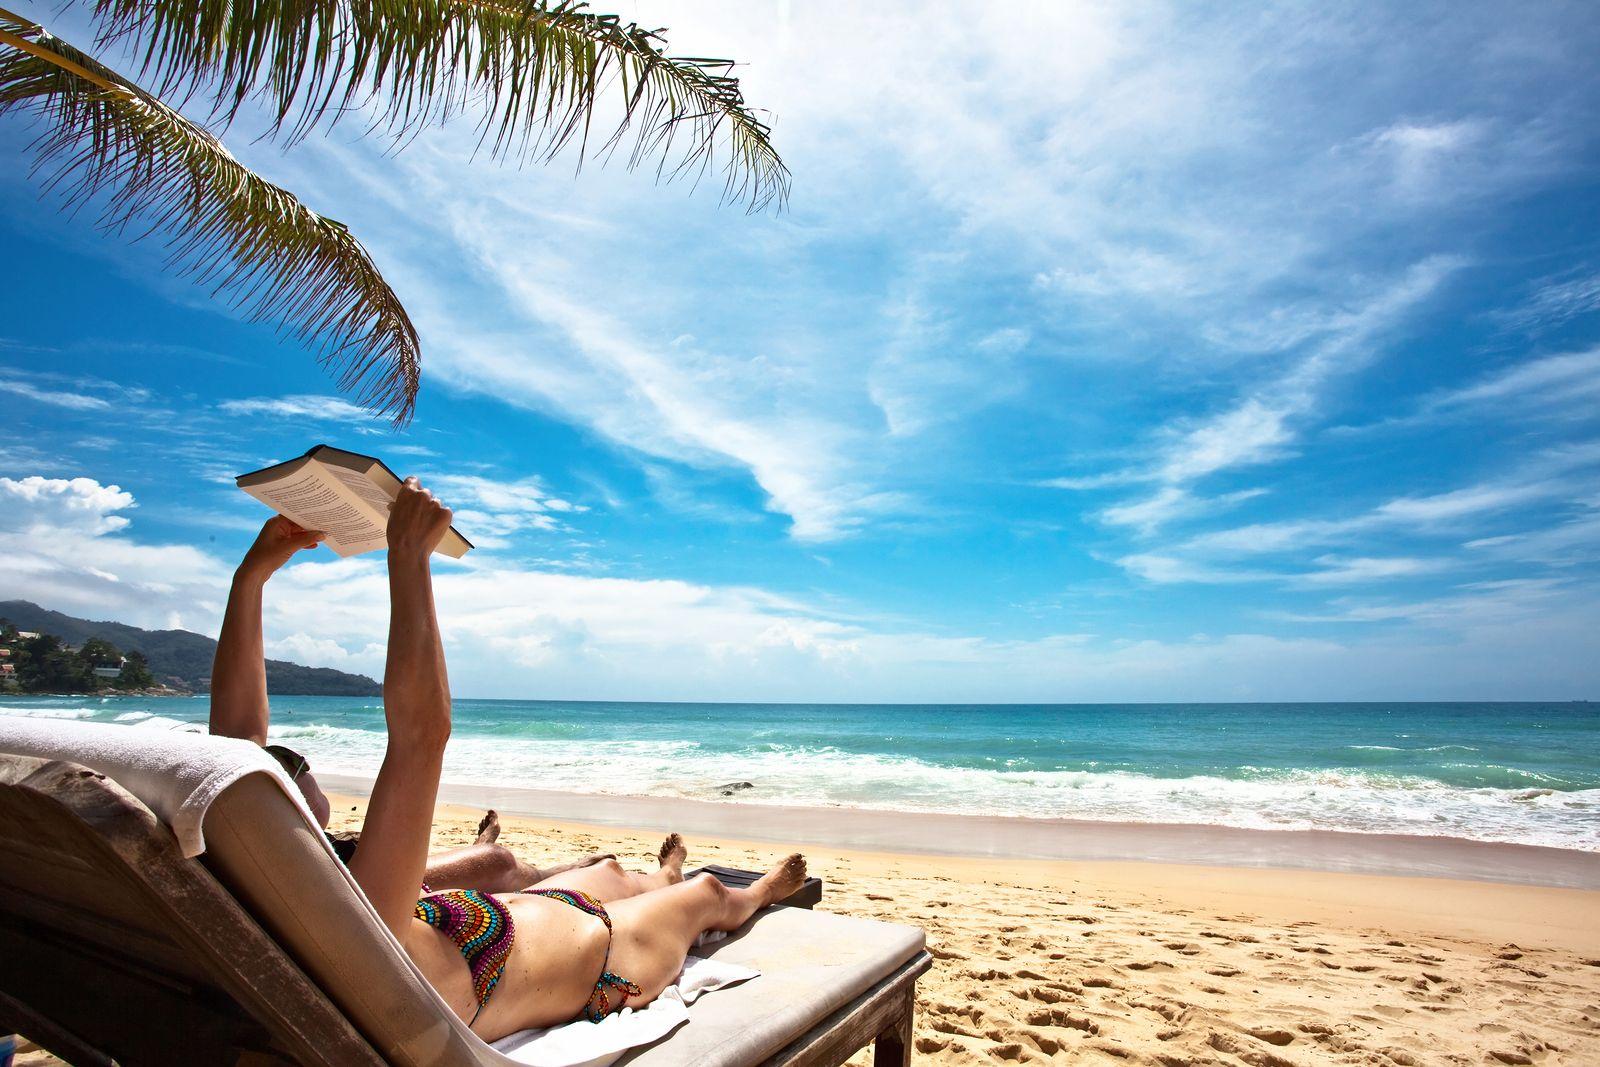 The Anastasia Beach Hotel Has The Ideal Location For A Fun Beach Holiday On Cyprus